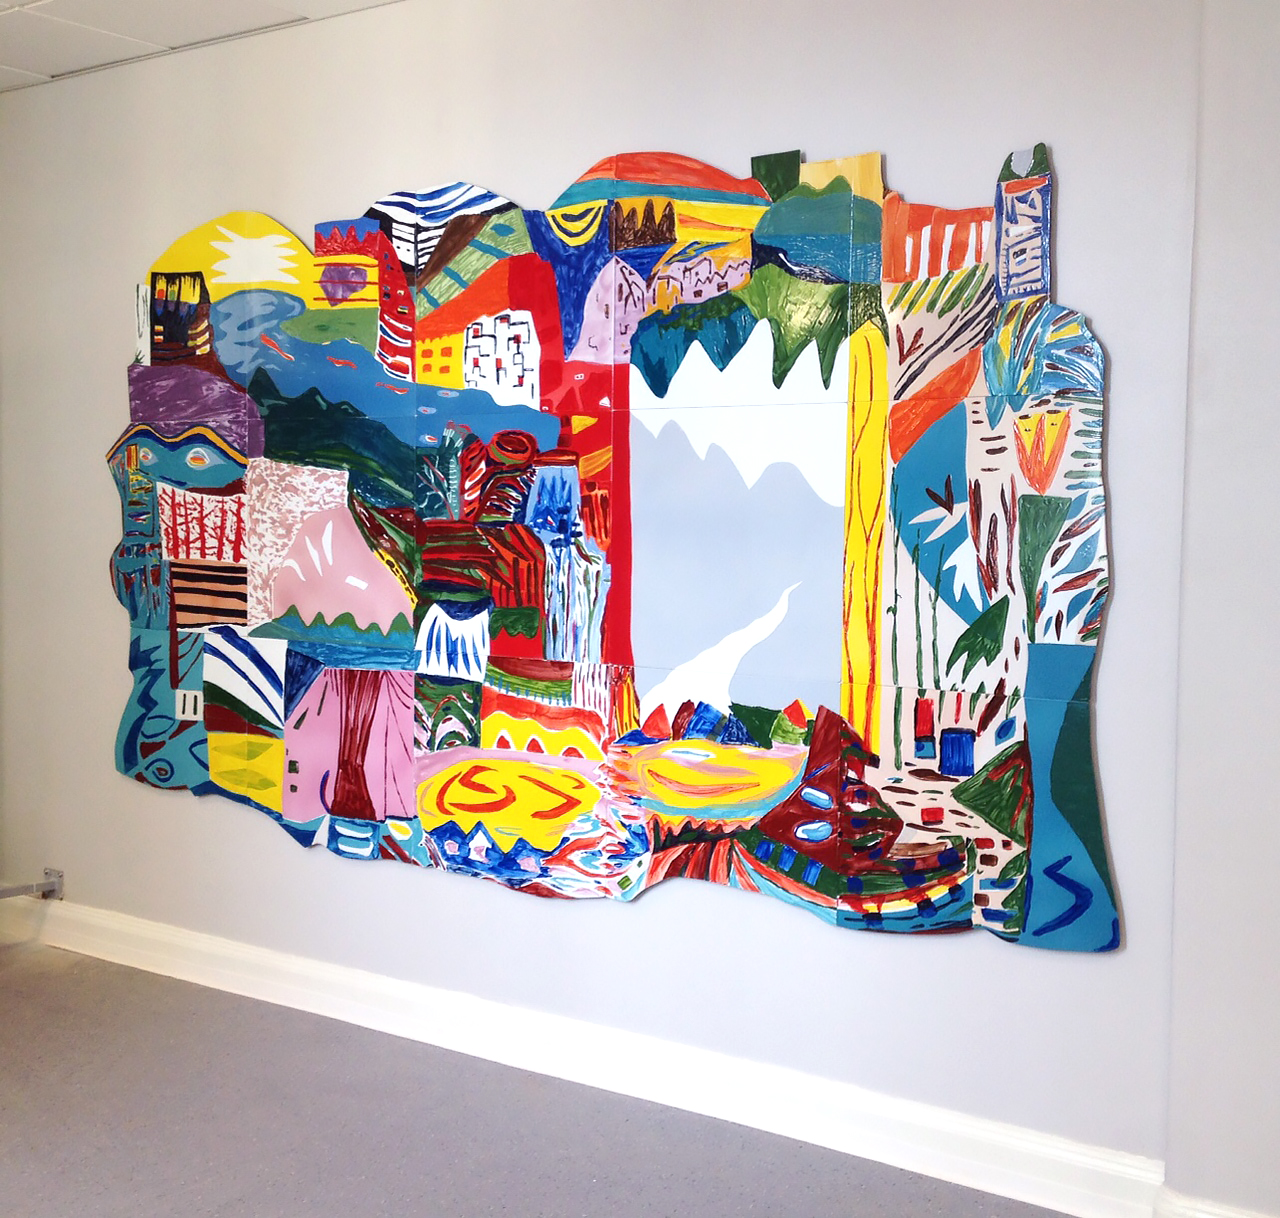 Marie Dahlstrand, Distant Dream, 2016, enamel painting on metal, 210 x 340 cm (82.7 x 133.8 inches), Elsa Brändström School, Linköping.